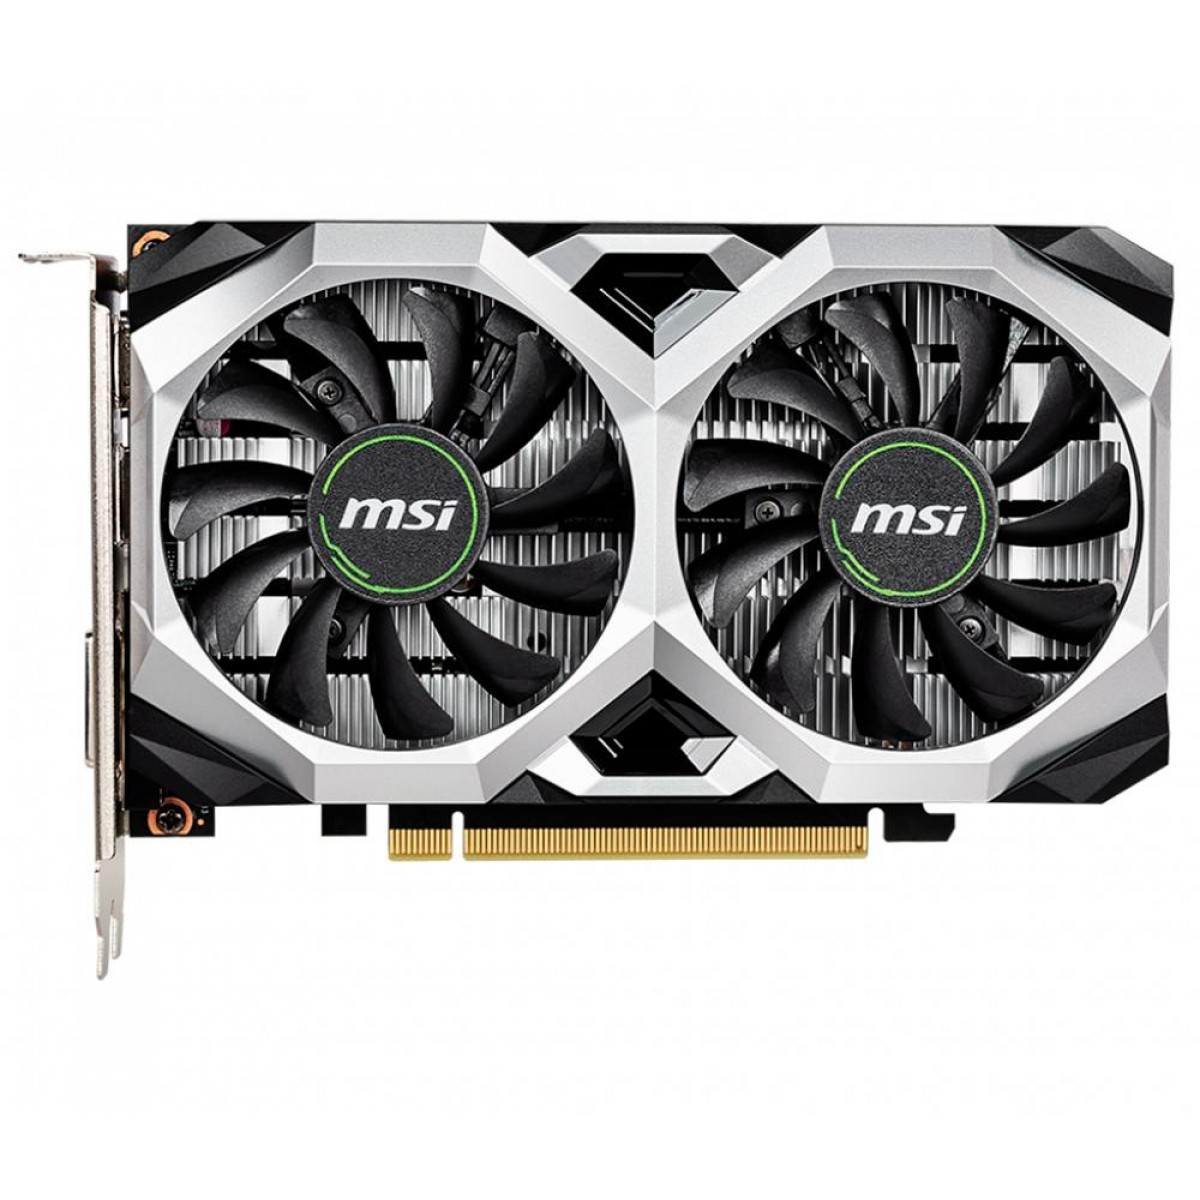 Placa de Vídeo MSI GeForce GTX 1650 D6 Ventus XS Dual OC, 4GB GDDR6, 128Bit